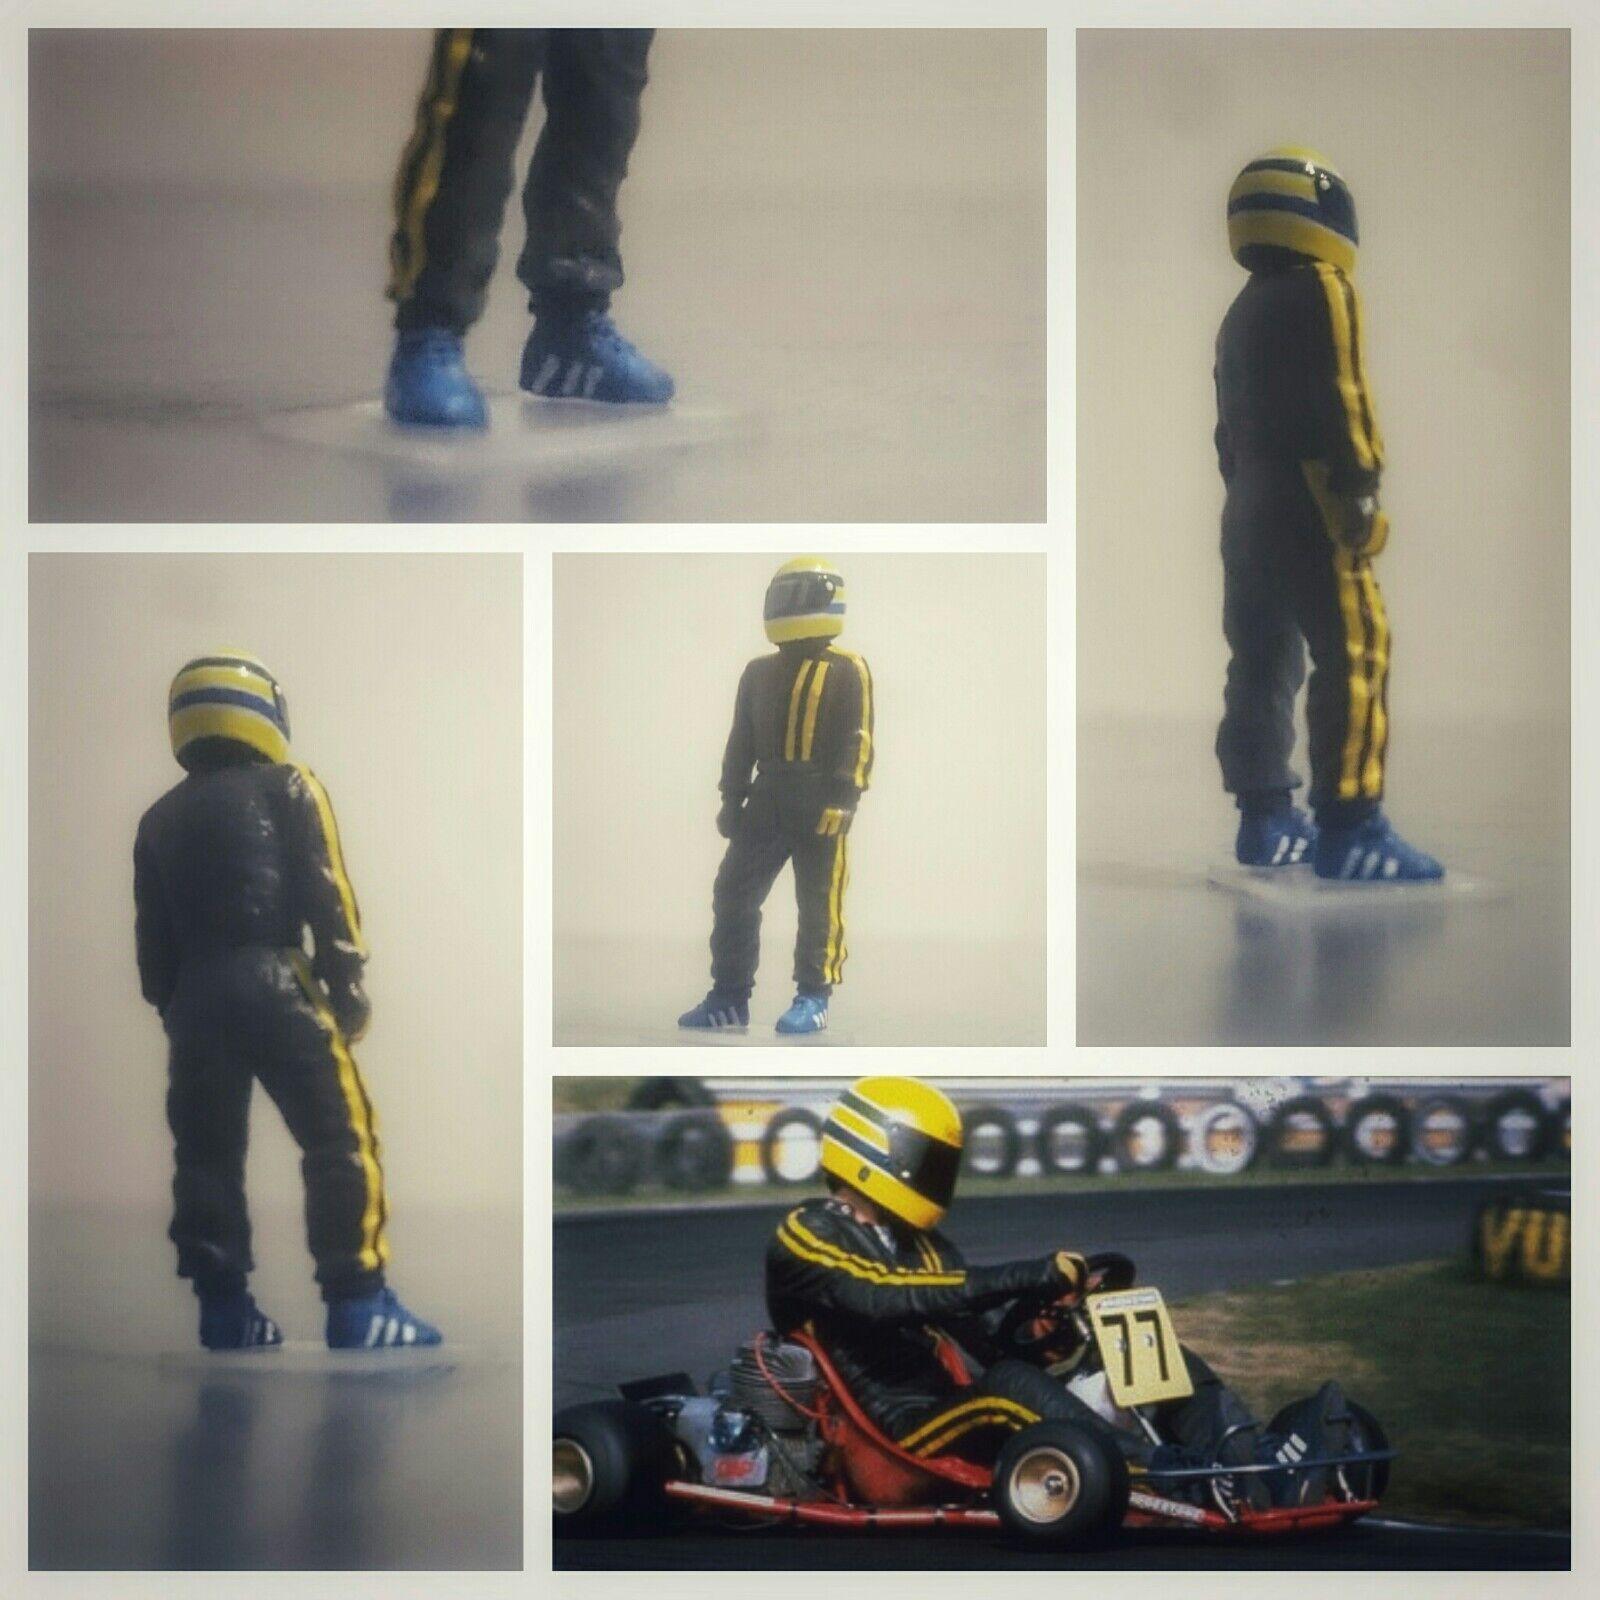 Ayrton SENNA Karting 70's figurine pilote diorama 1 43 F1 driver figure